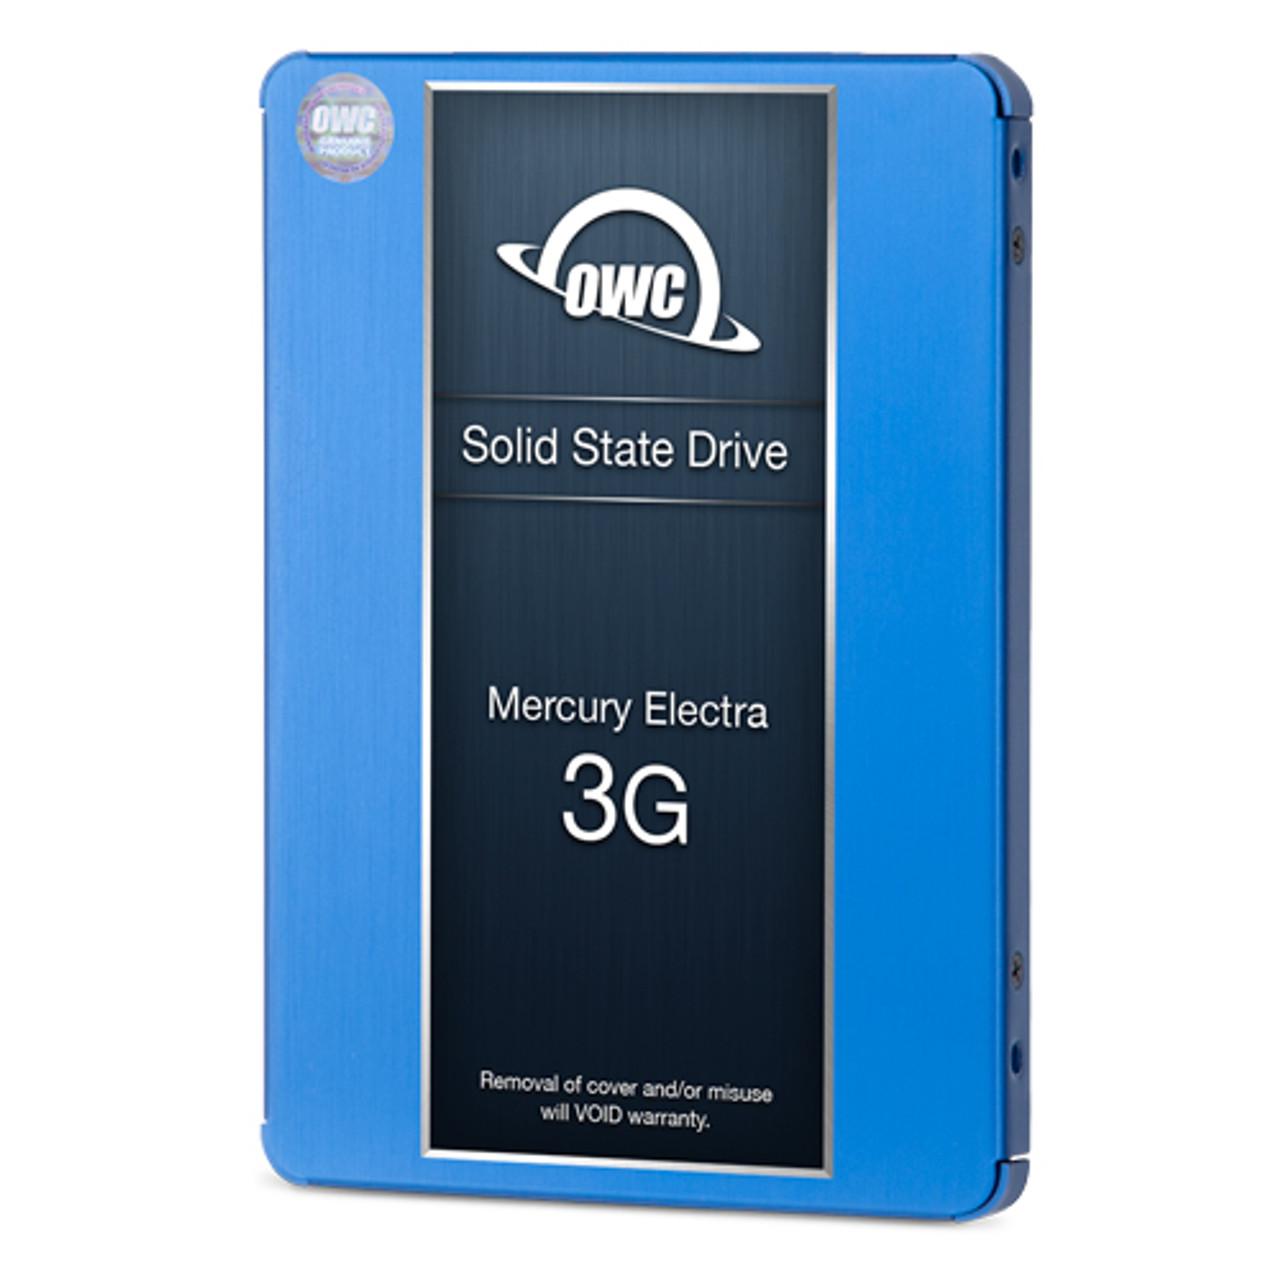 (*)Open Box 500GB OWC Mercury Electra 3G SSD and HDD DIY Bundle Kit for 2009 - 2010 iMac